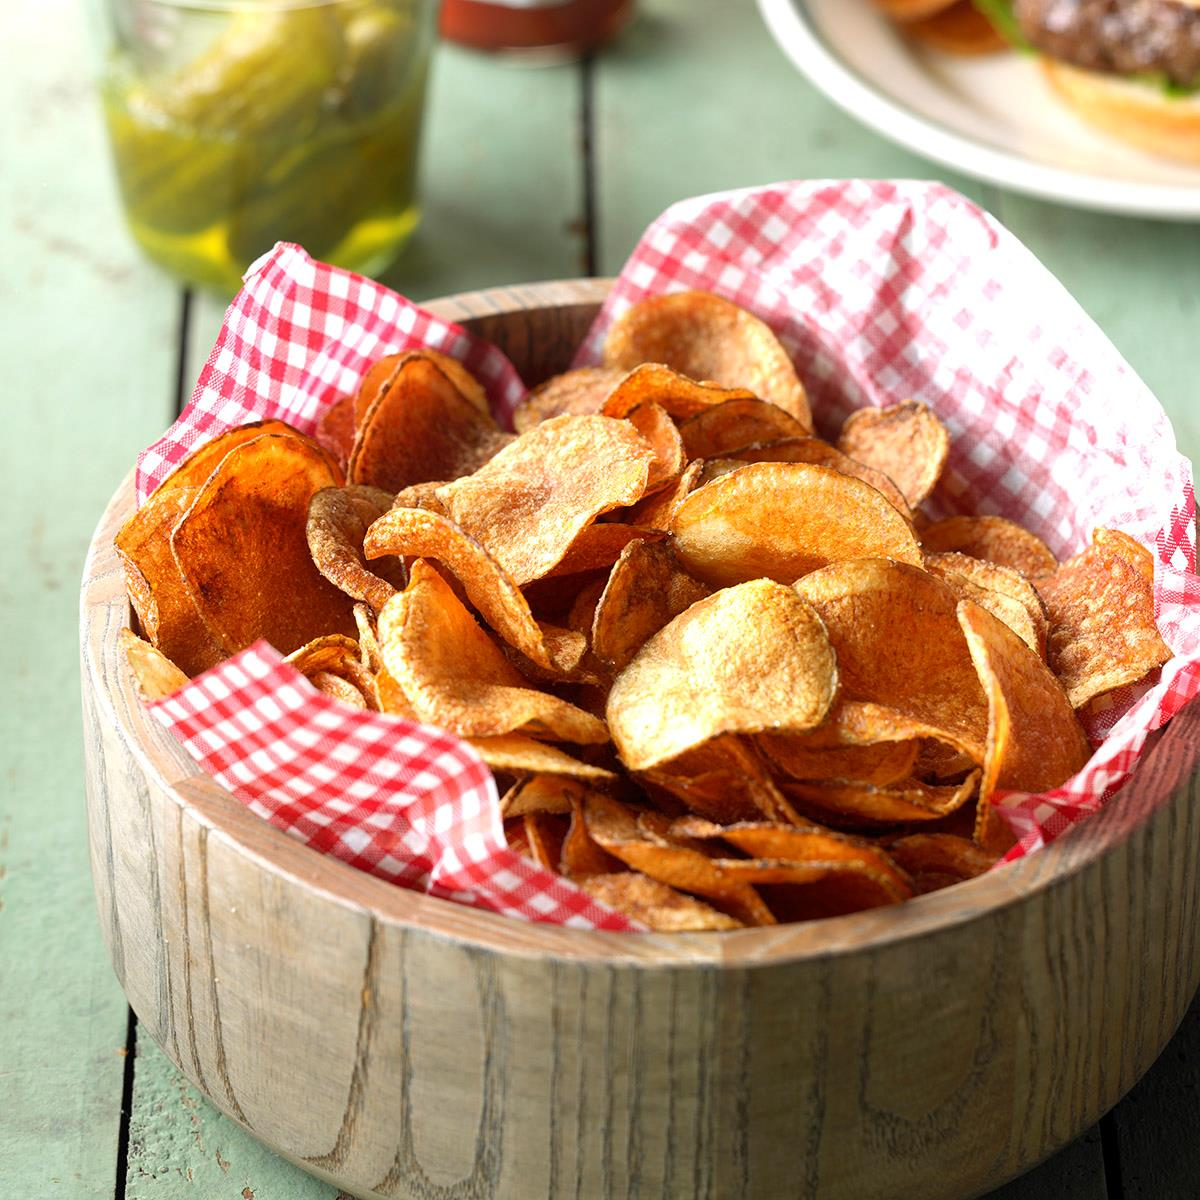 Homemade Potato Chips image